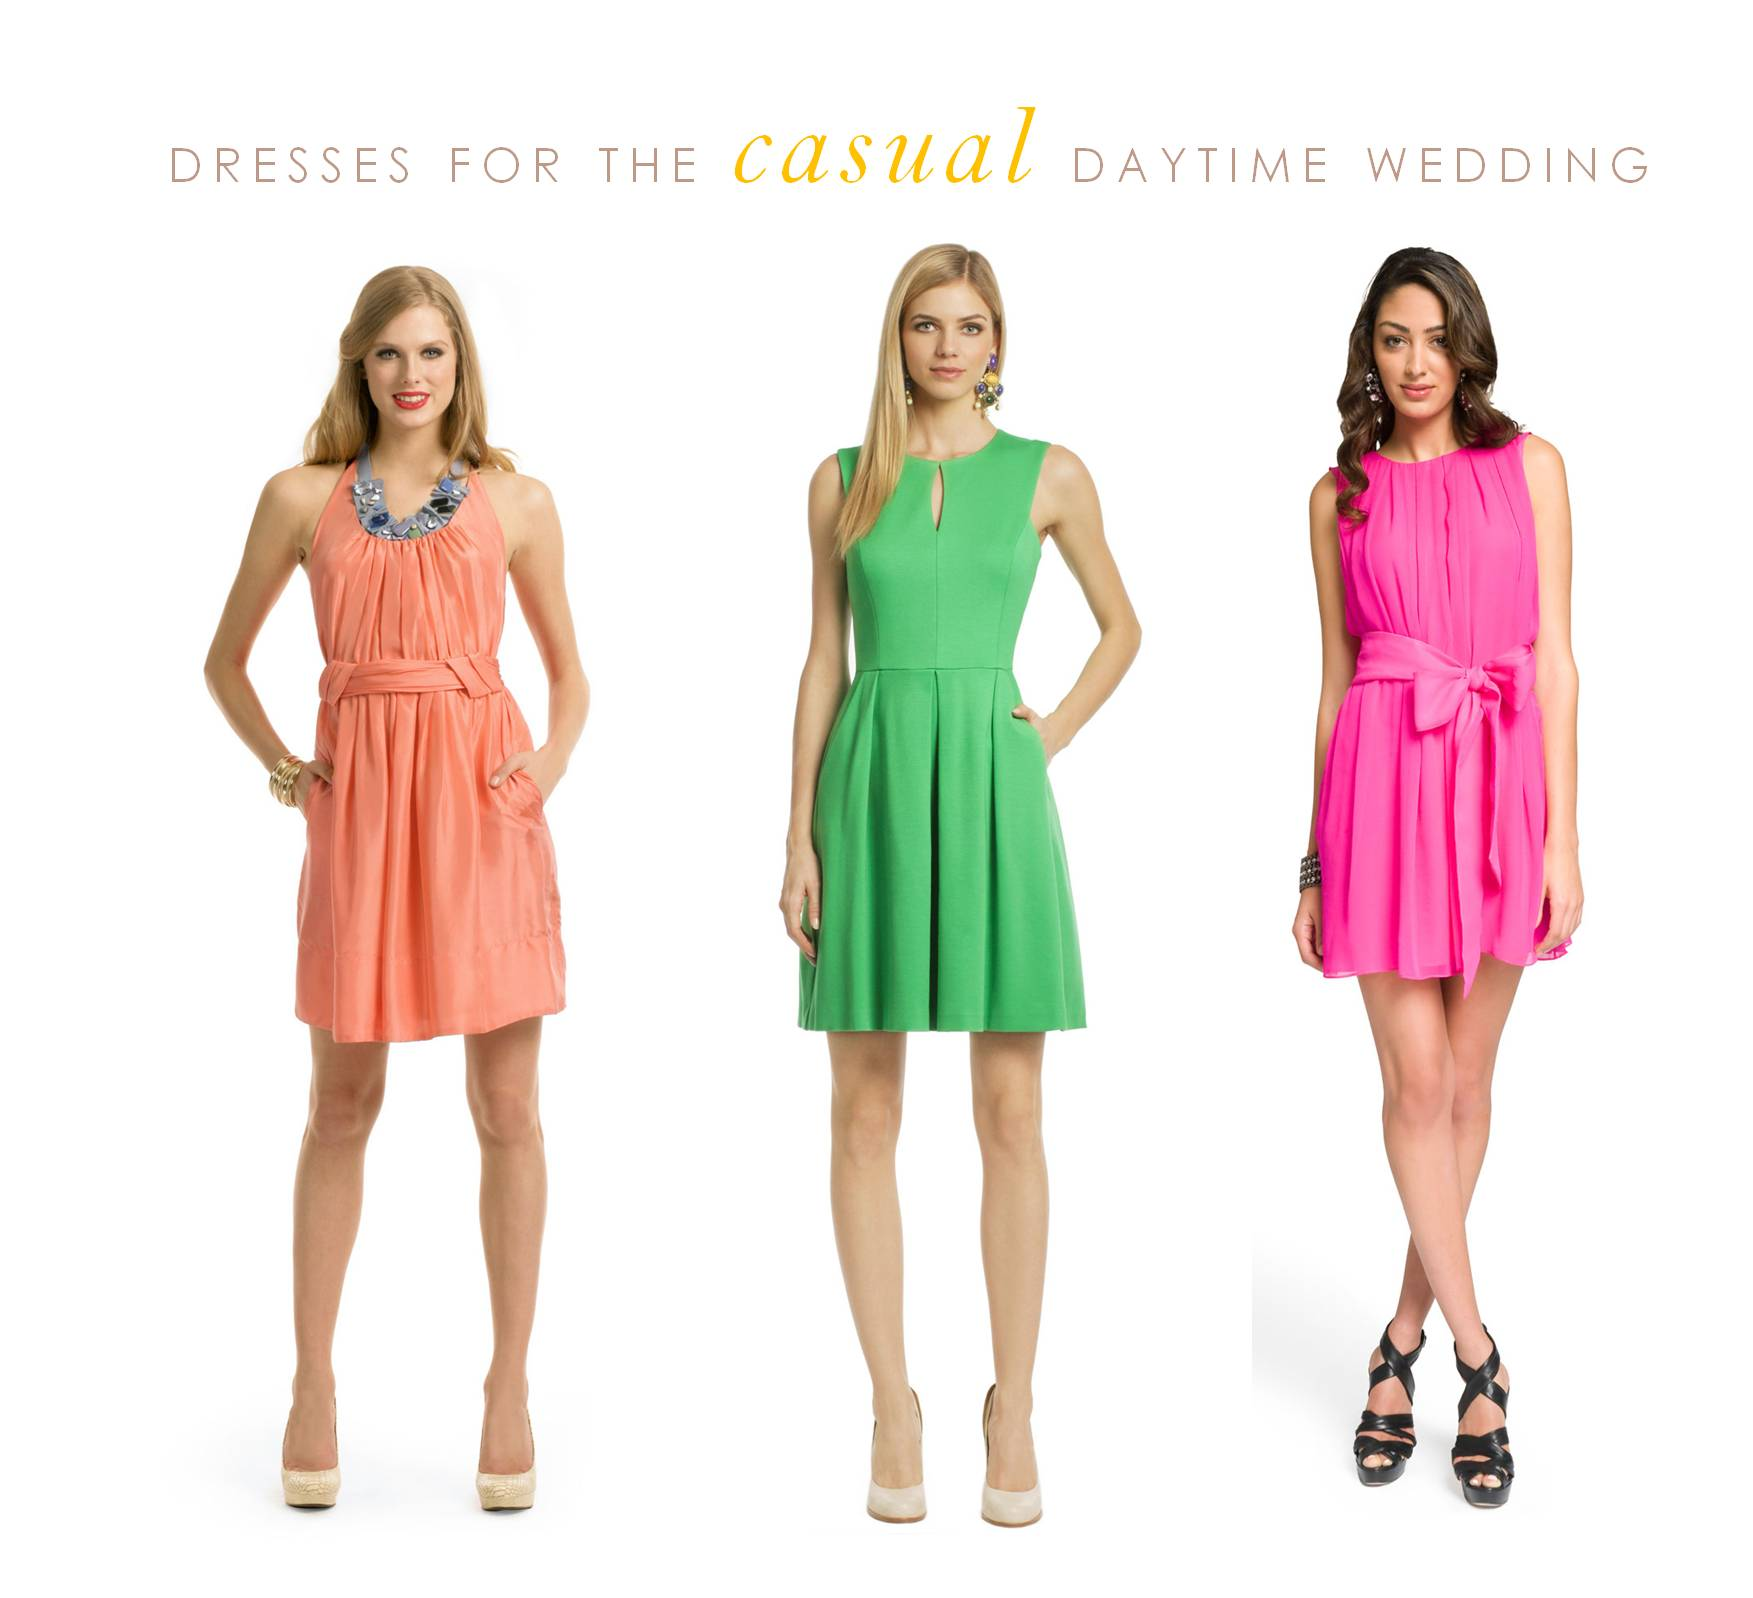 dresses for weddings august edition beach dresses for weddings